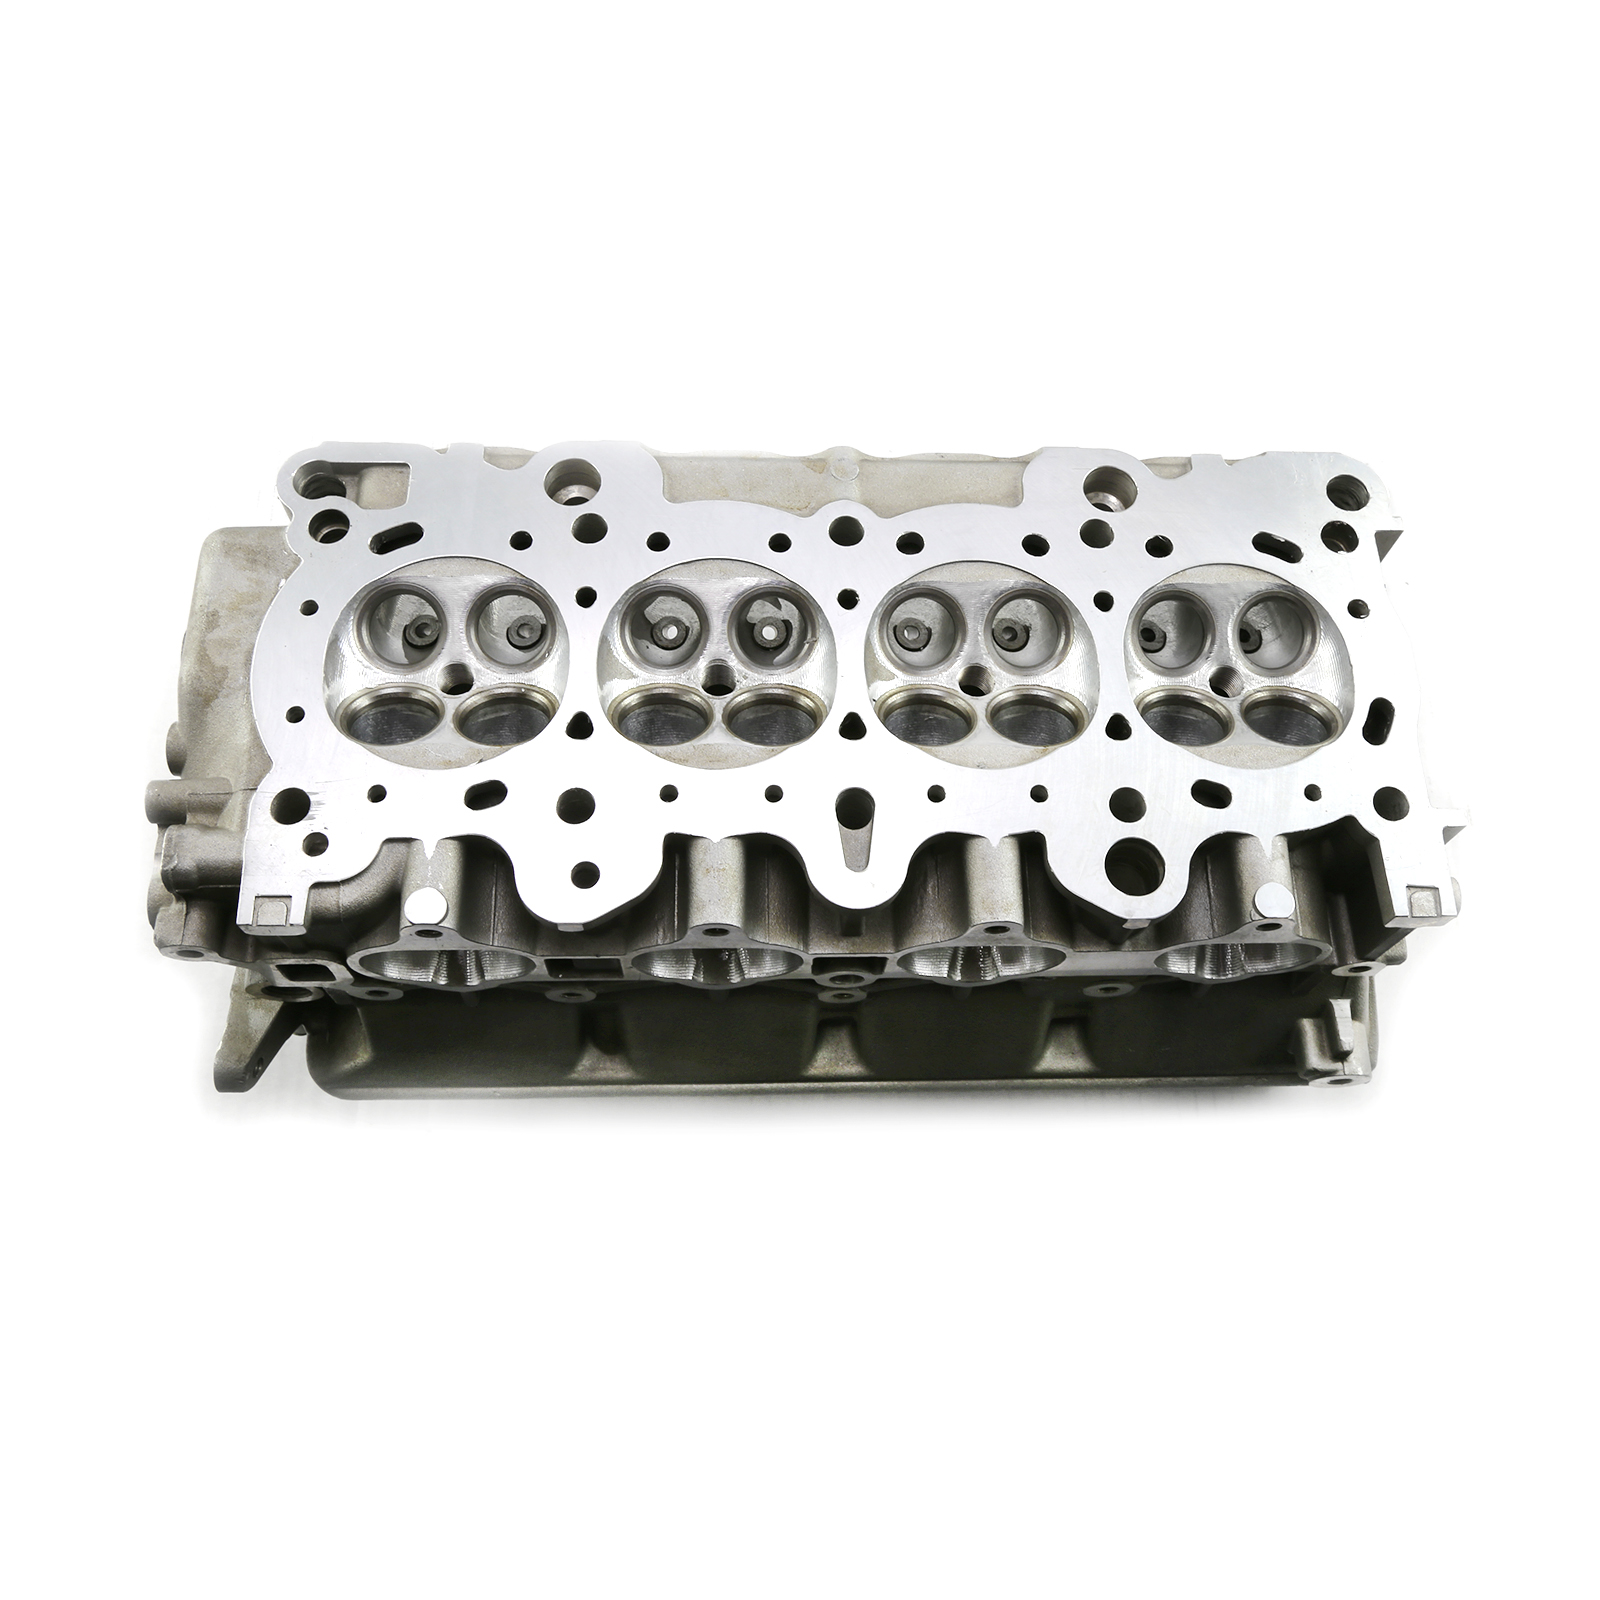 PCE® PCE281.1781 Honda 4Cyl B16A Vtec Full CNC Aluminum Bare Cylinder Head